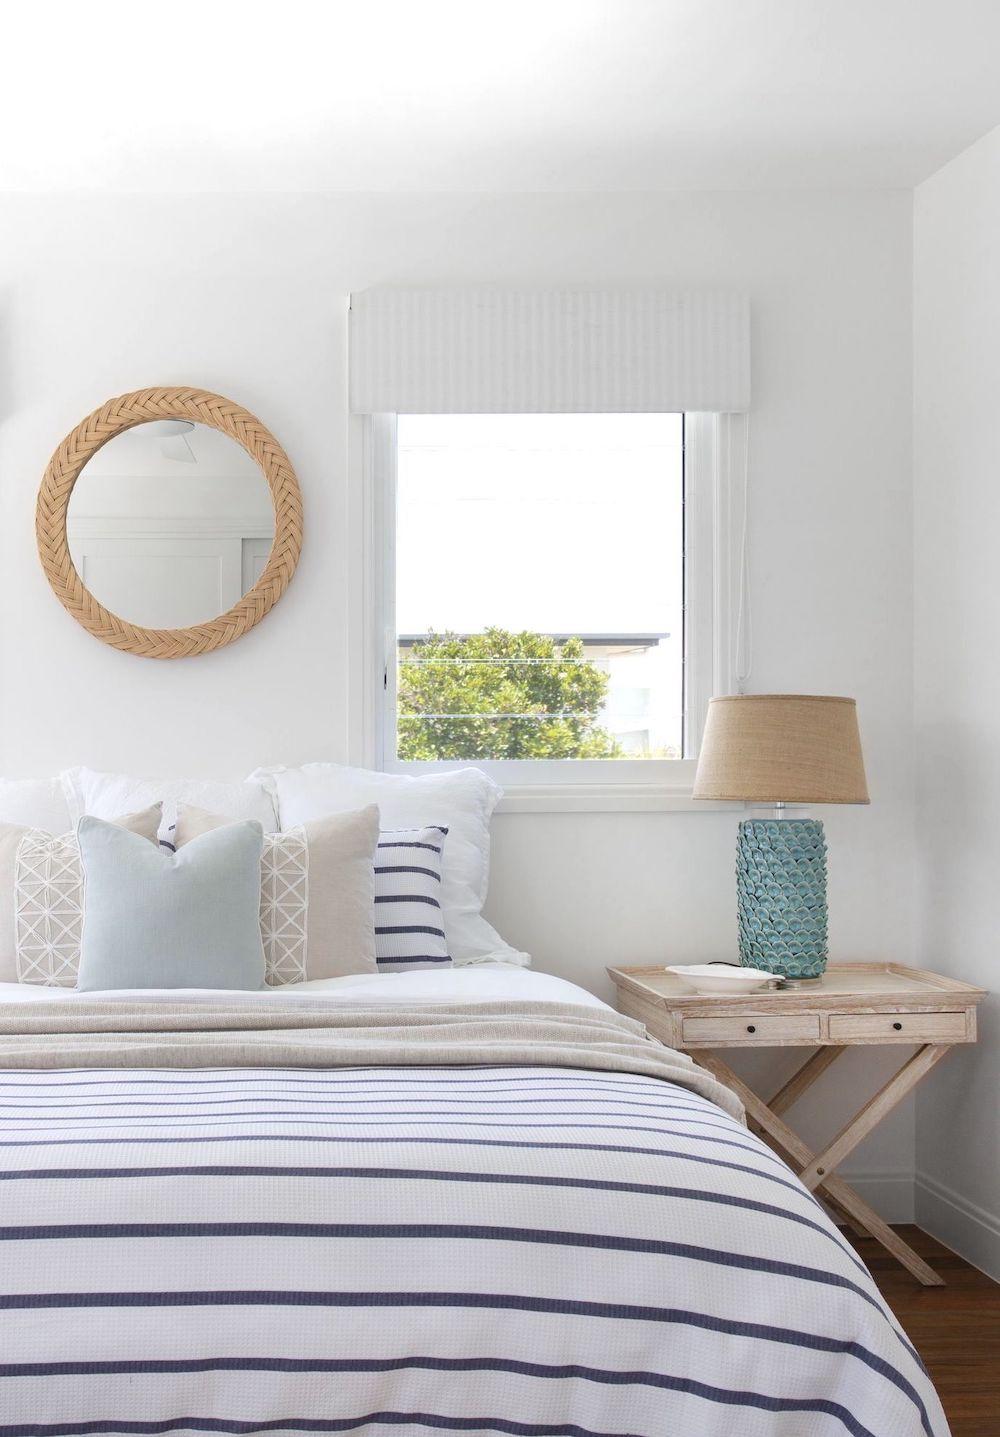 Coastal bedroom with nautical blue striped bedspread @donna_guyler_design